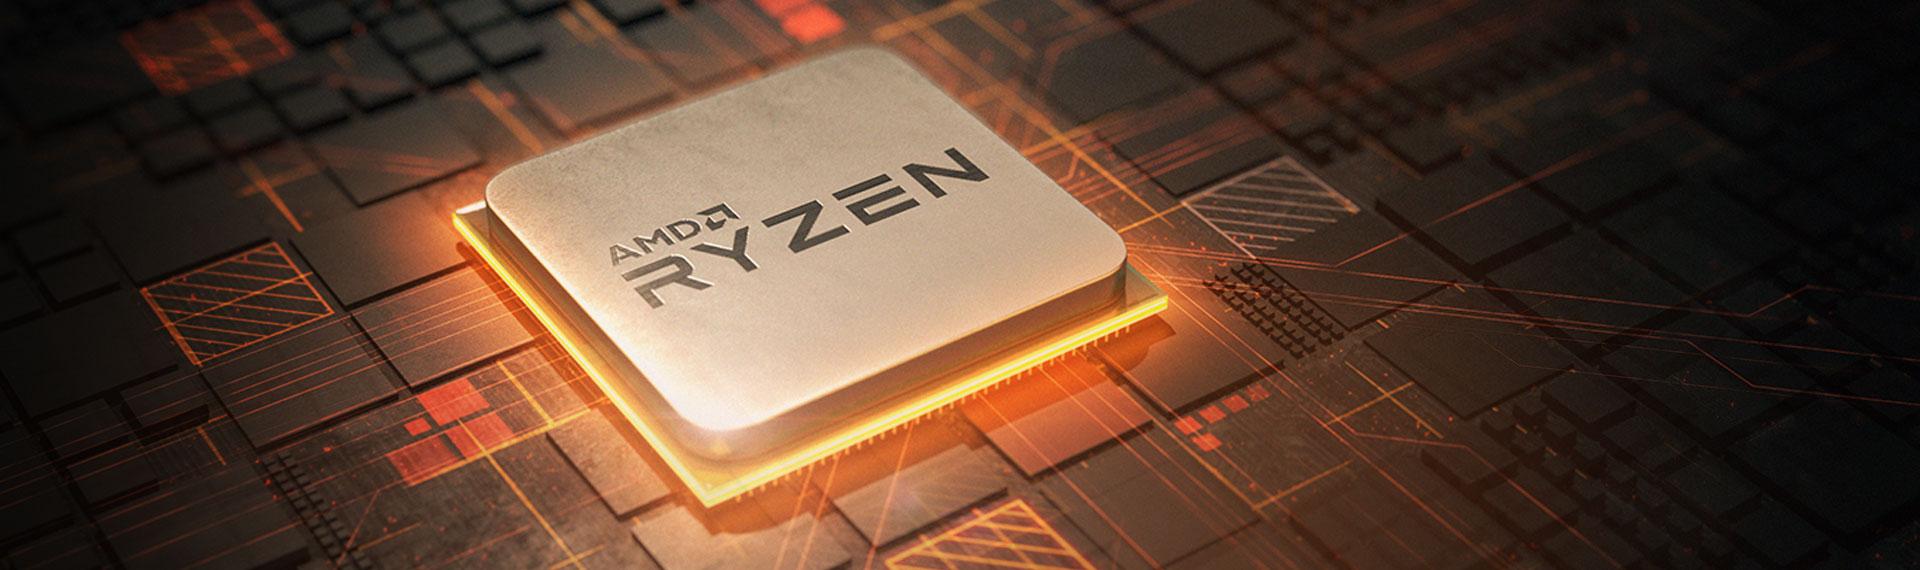 Penting Nih! Ketahui Kisaran Harga Prosesor AMD Ryzen Sebelum Memakainya